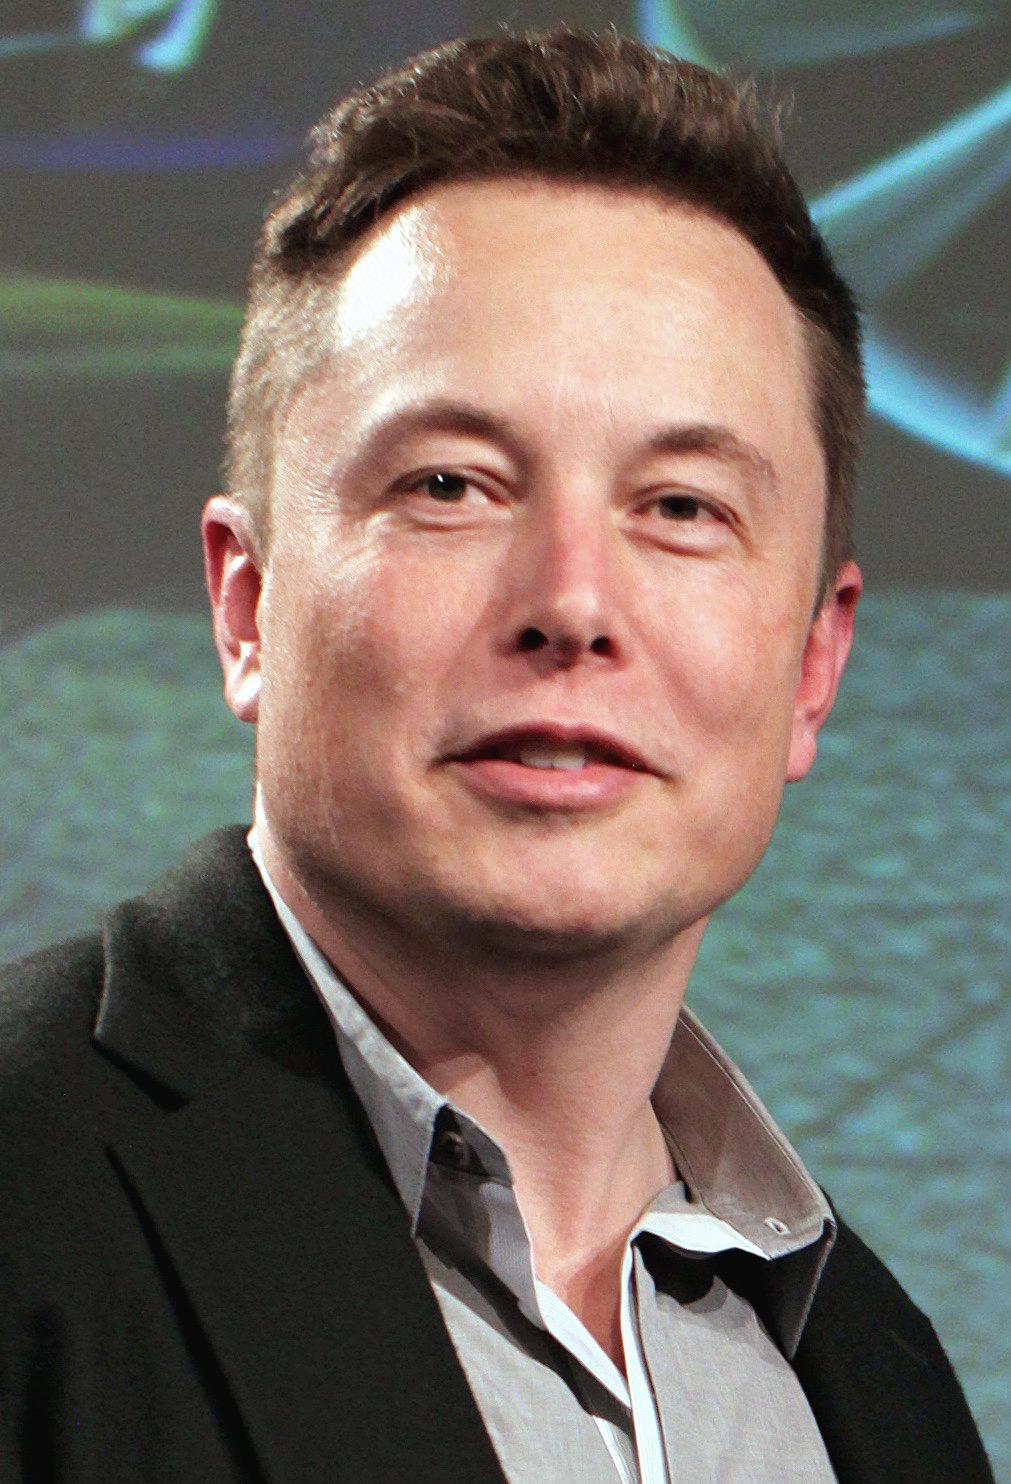 Elon Musk Avatar